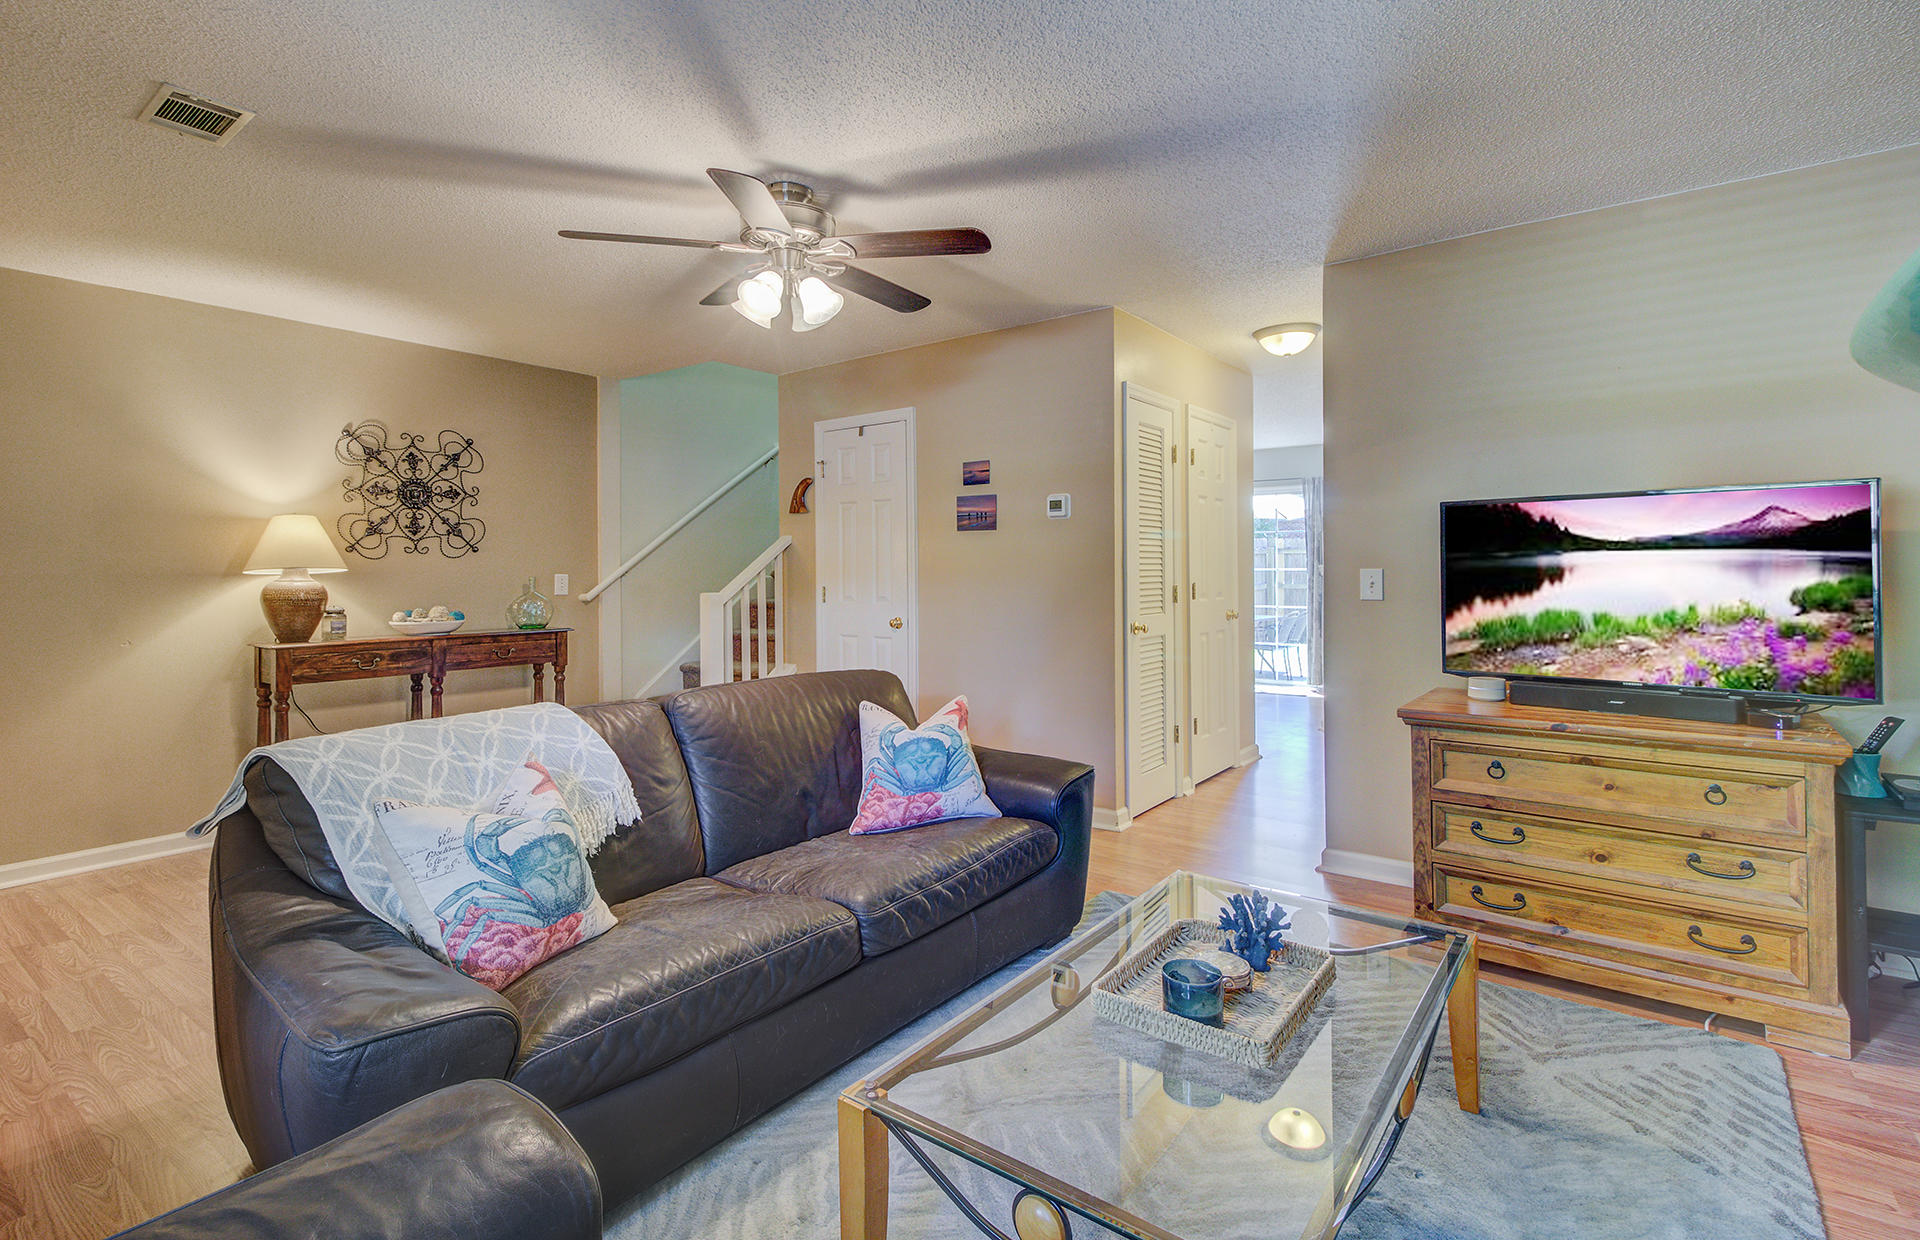 Wando East Homes For Sale - 1664 Hunters Run, Mount Pleasant, SC - 22